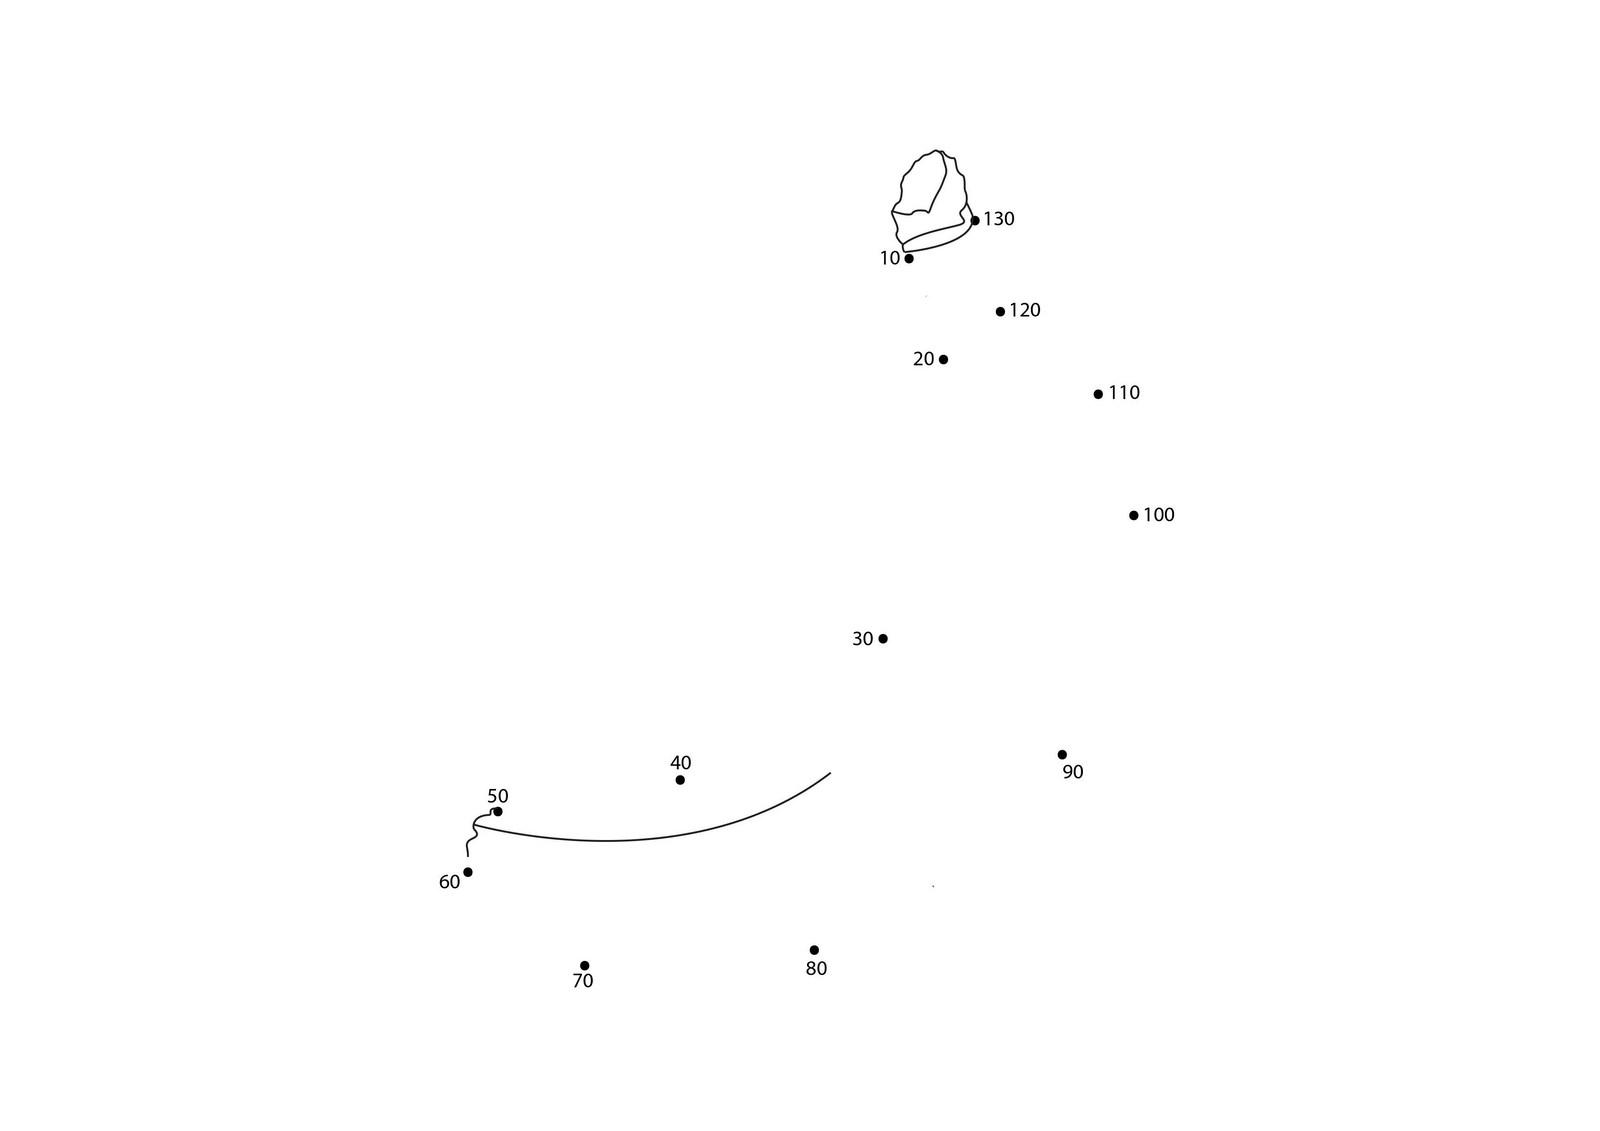 Skip Counting Dot To Dot Worksheets (11)